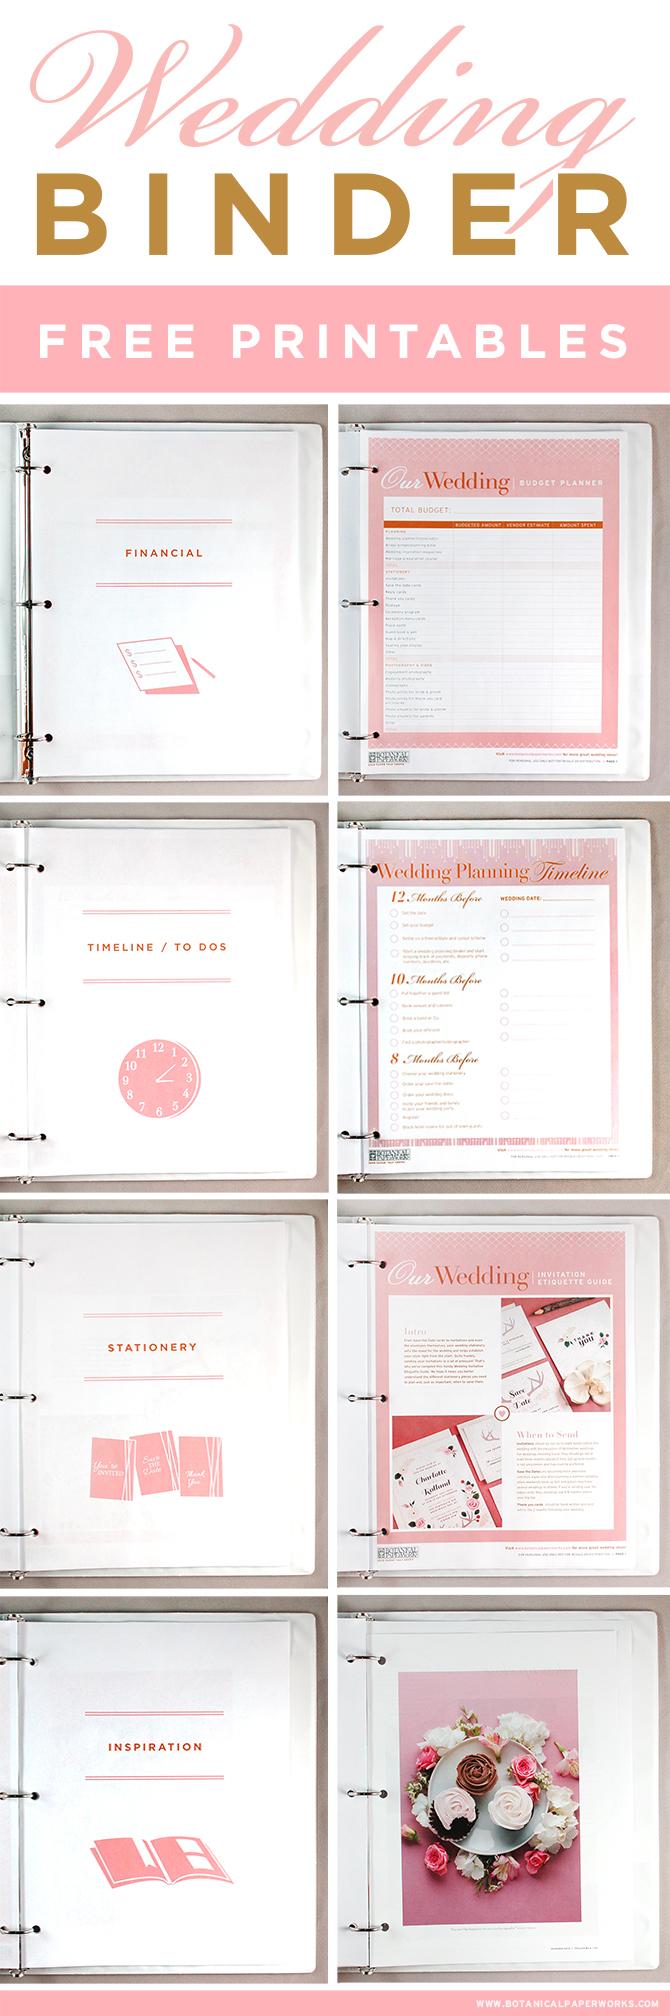 12 Ideas Wedding Planner Book Pdf On A Budget – Wedding Ideas - Free Printable Wedding Planner Book Pdf